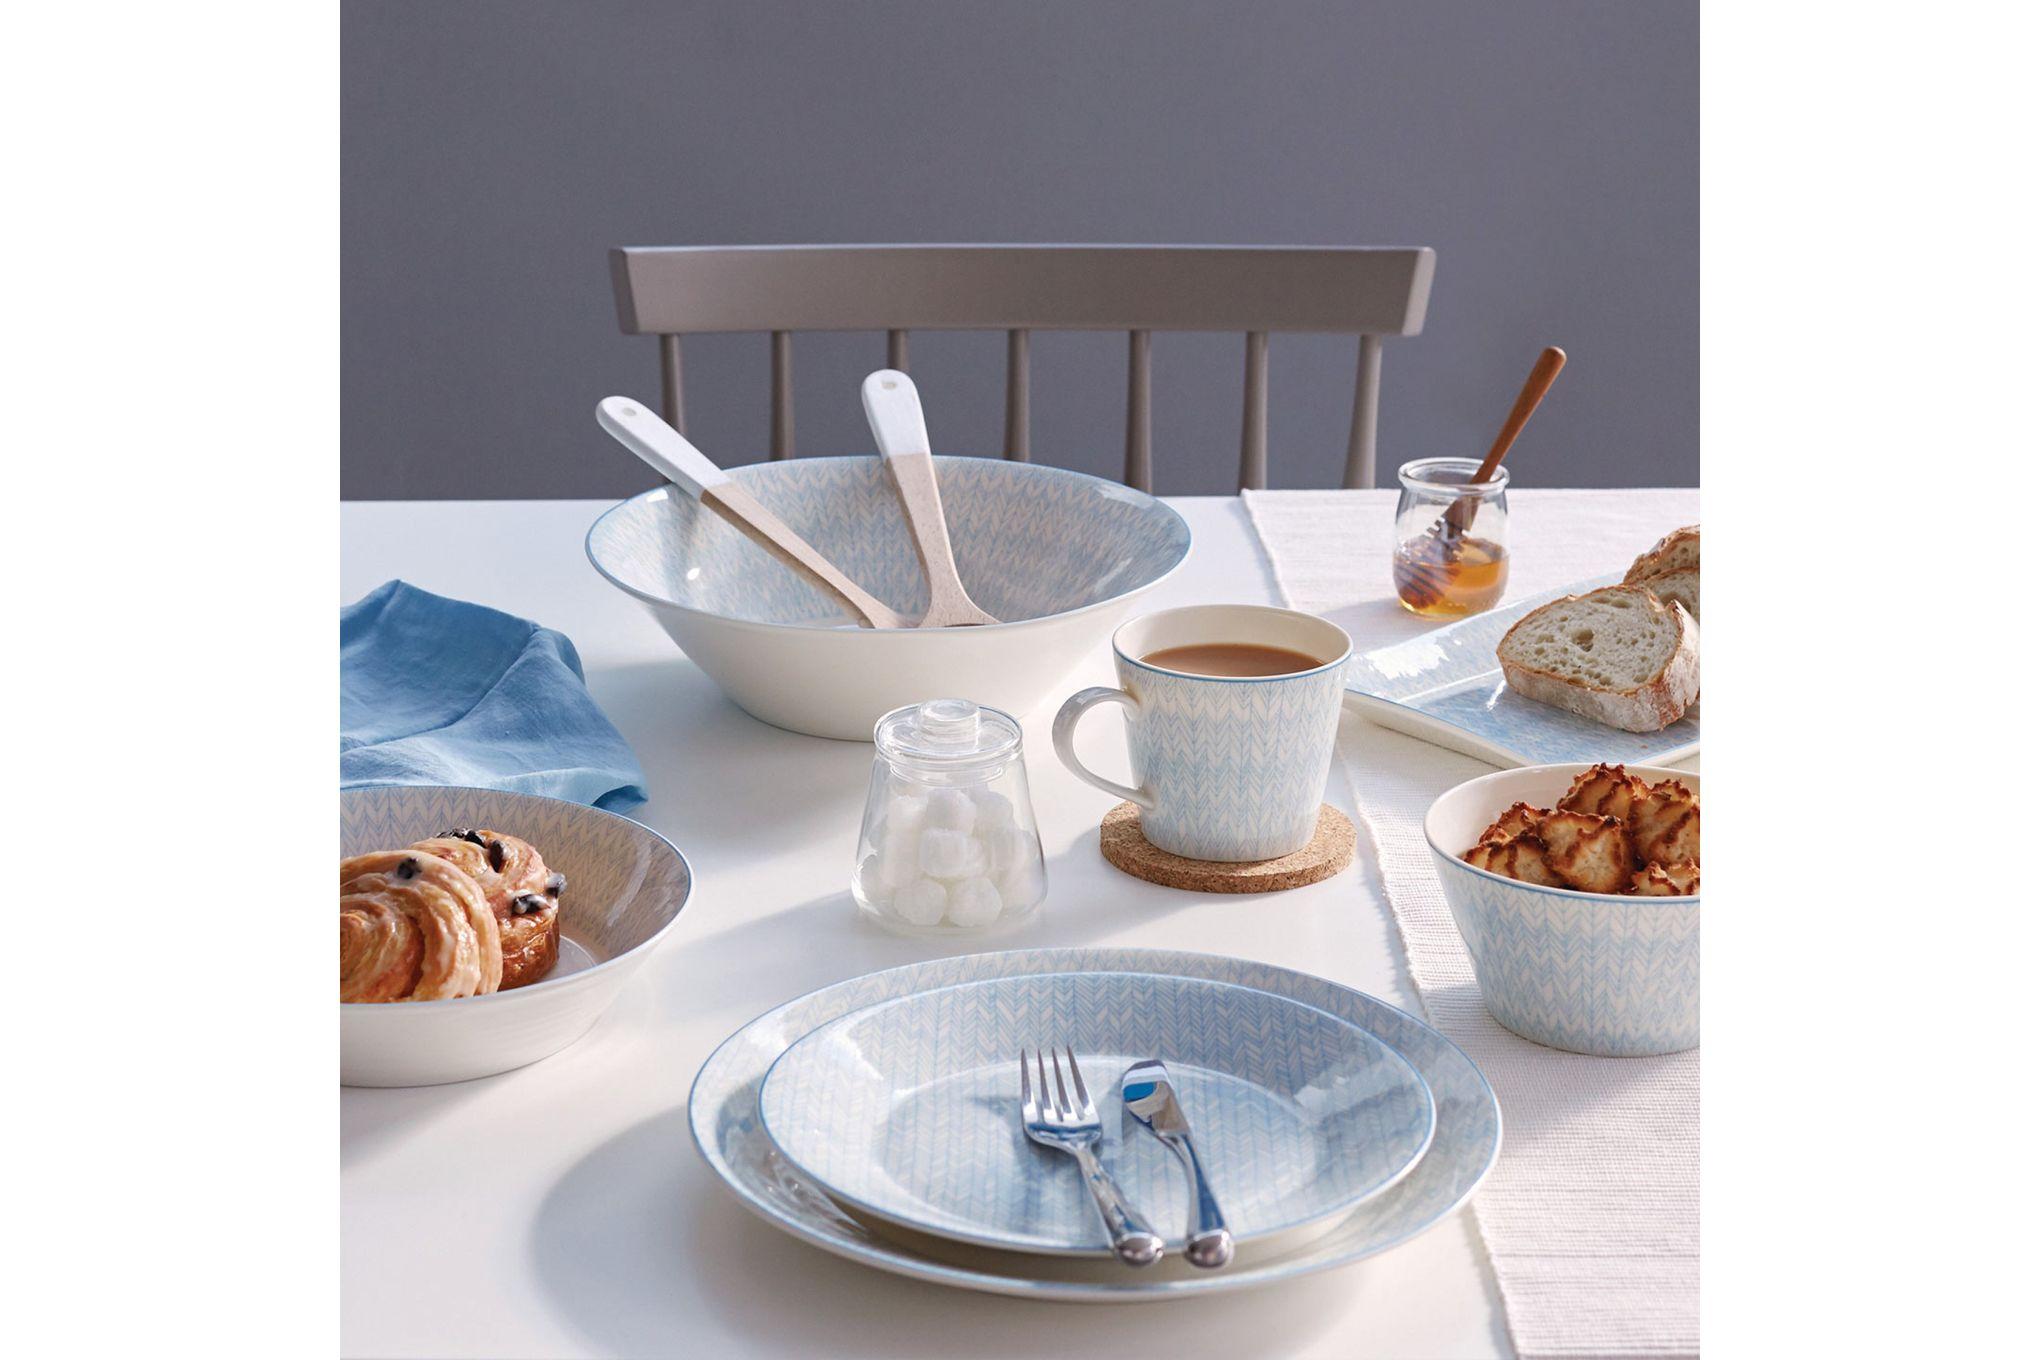 Royal Doulton Pastels 16 Piece Set Herringbone - 4 x Plate 28cm, Plate 23cm, Bowl 15cm, Mug thumb 3